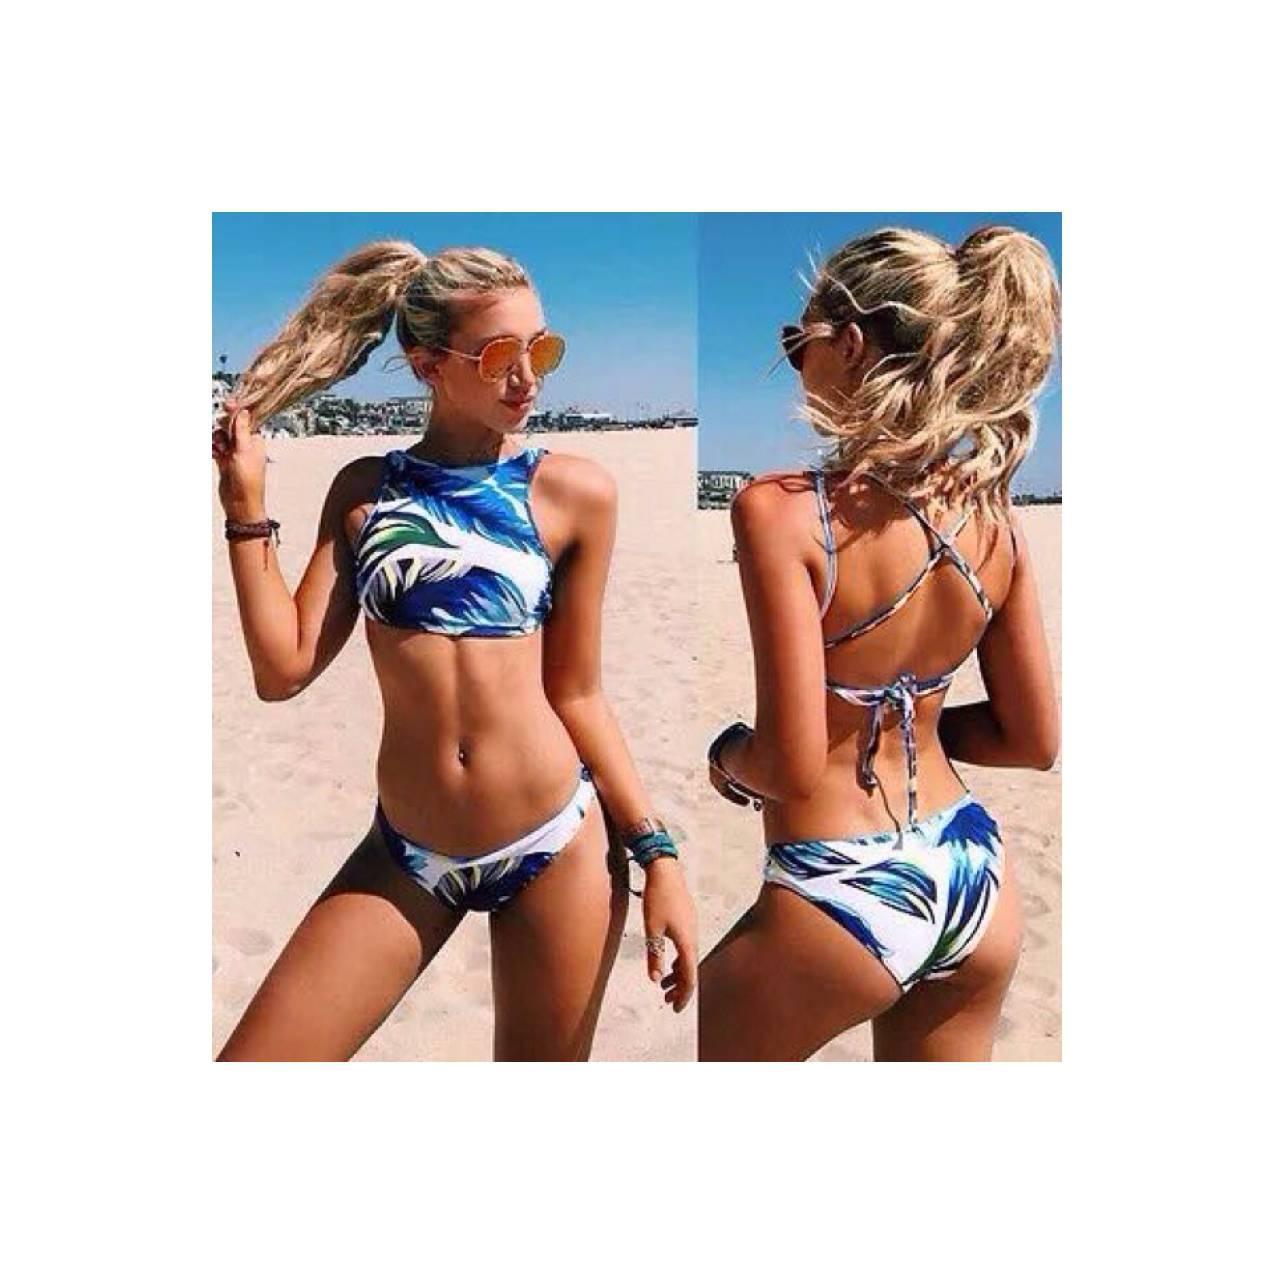 Jual Bikini Lingerie Swimsuit Baju Renang Underwear Celana Dalam Wani